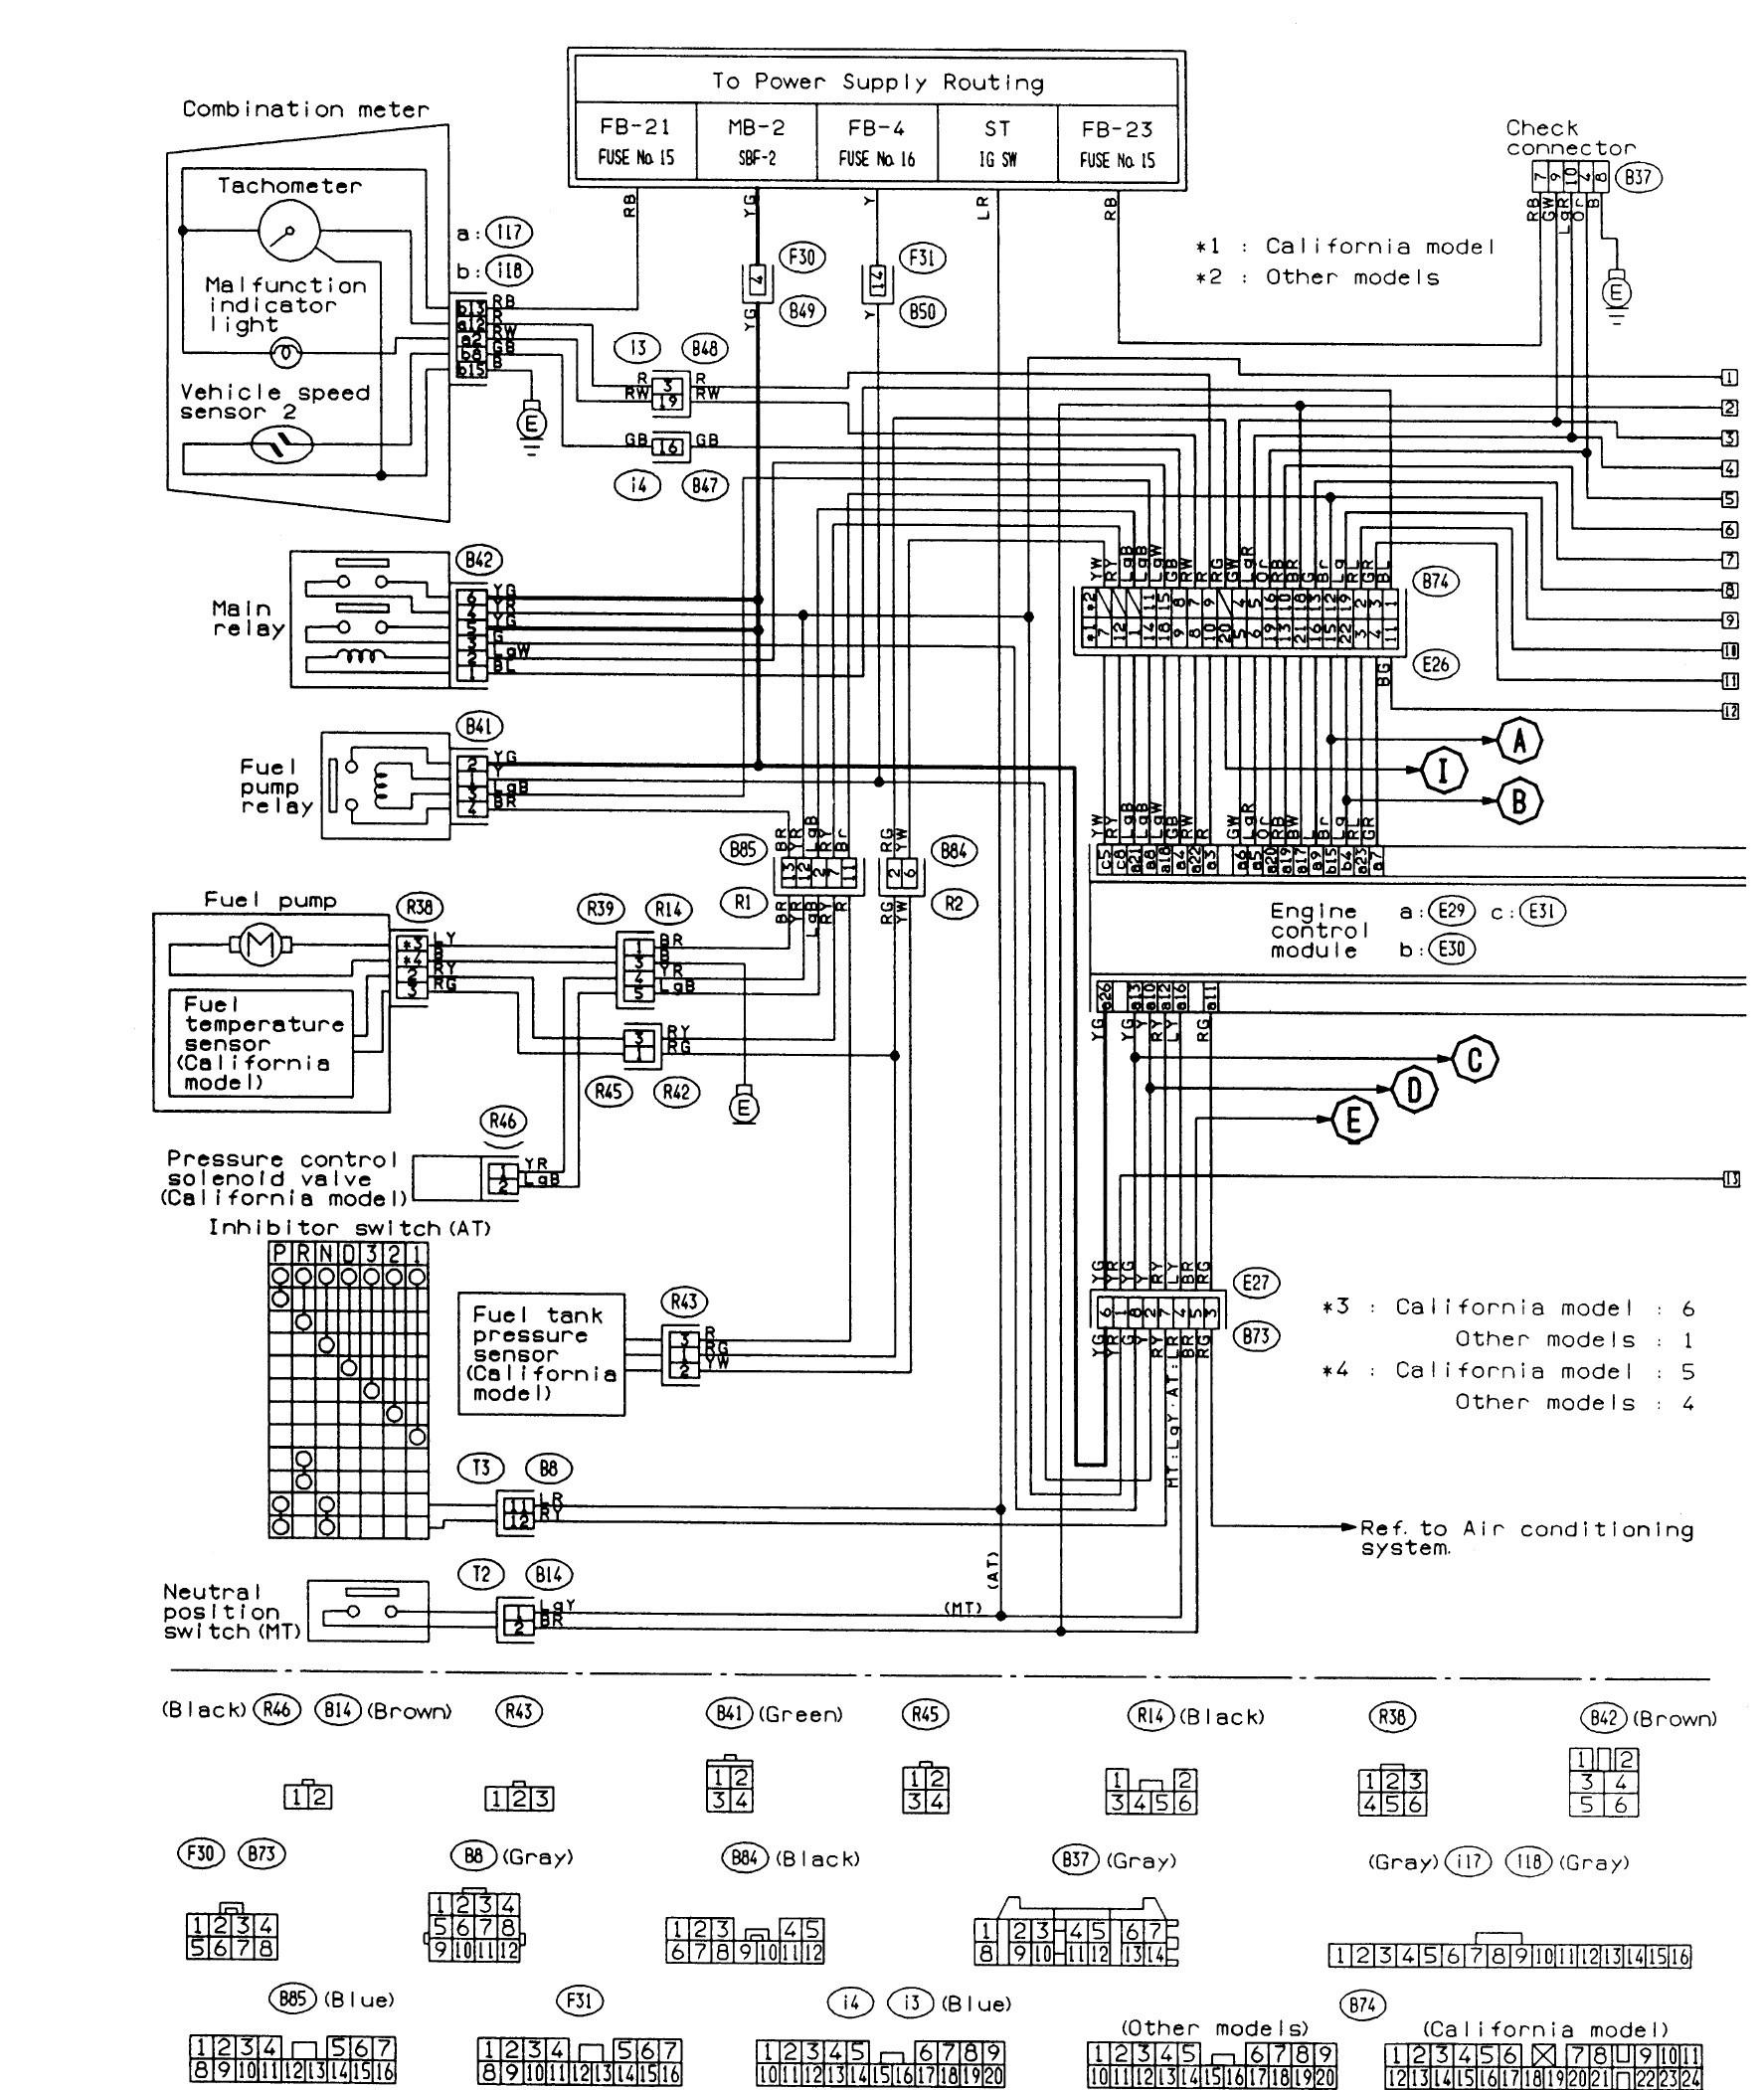 subaru wiring diagram color codes Download-Wiring Diagram Colors Best Subaru Wiring Diagram Color Codes Best Pioneer Speaker Wire Color 12-i